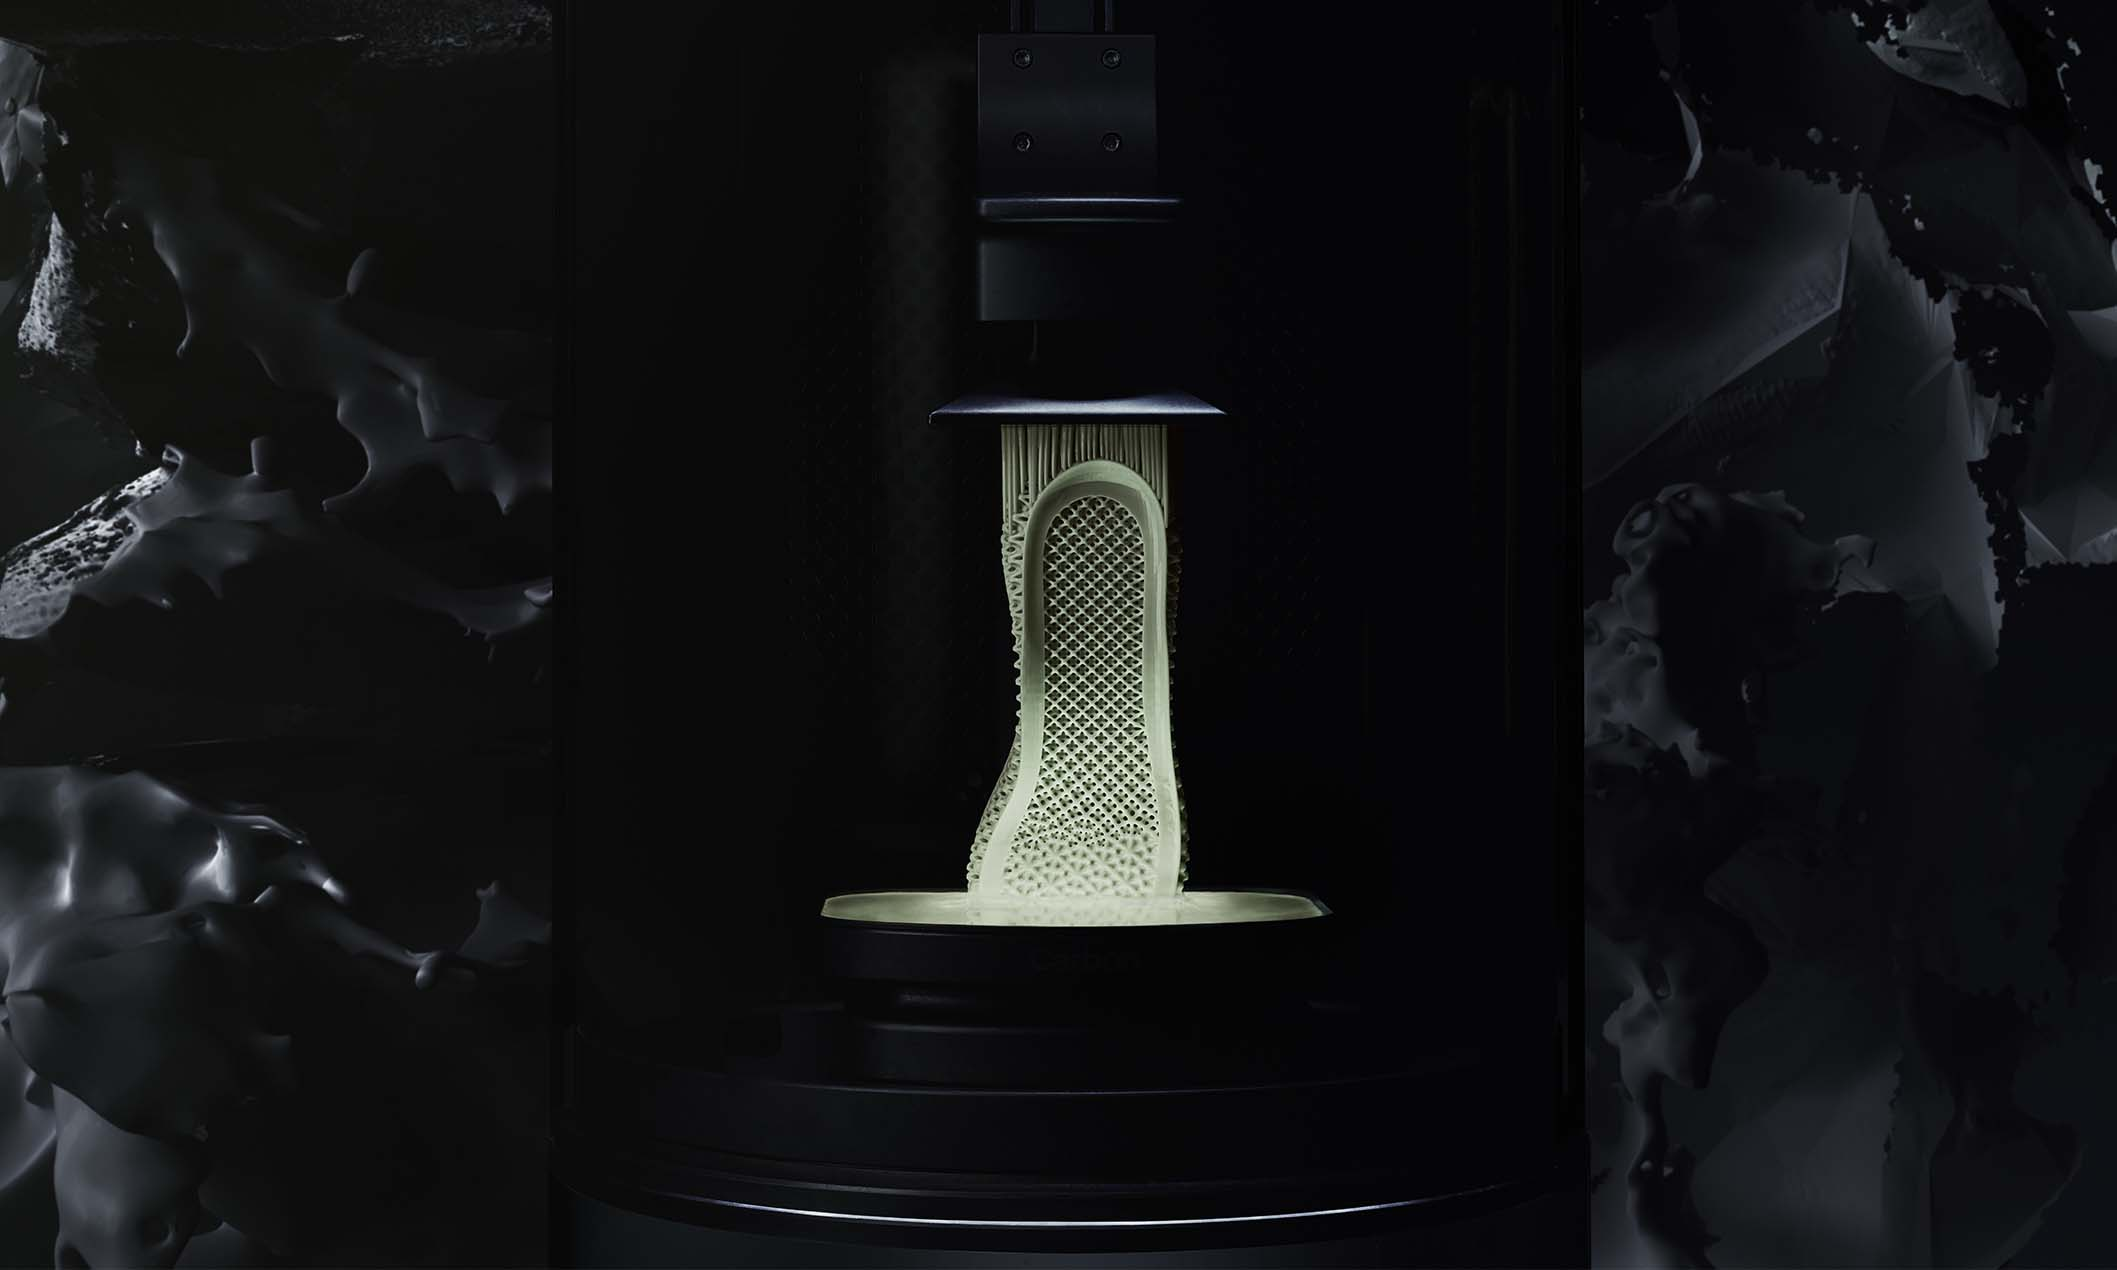 3D printanje potplata za Adidas Futurecraft 4D tenisice, izvor: Sculpteo